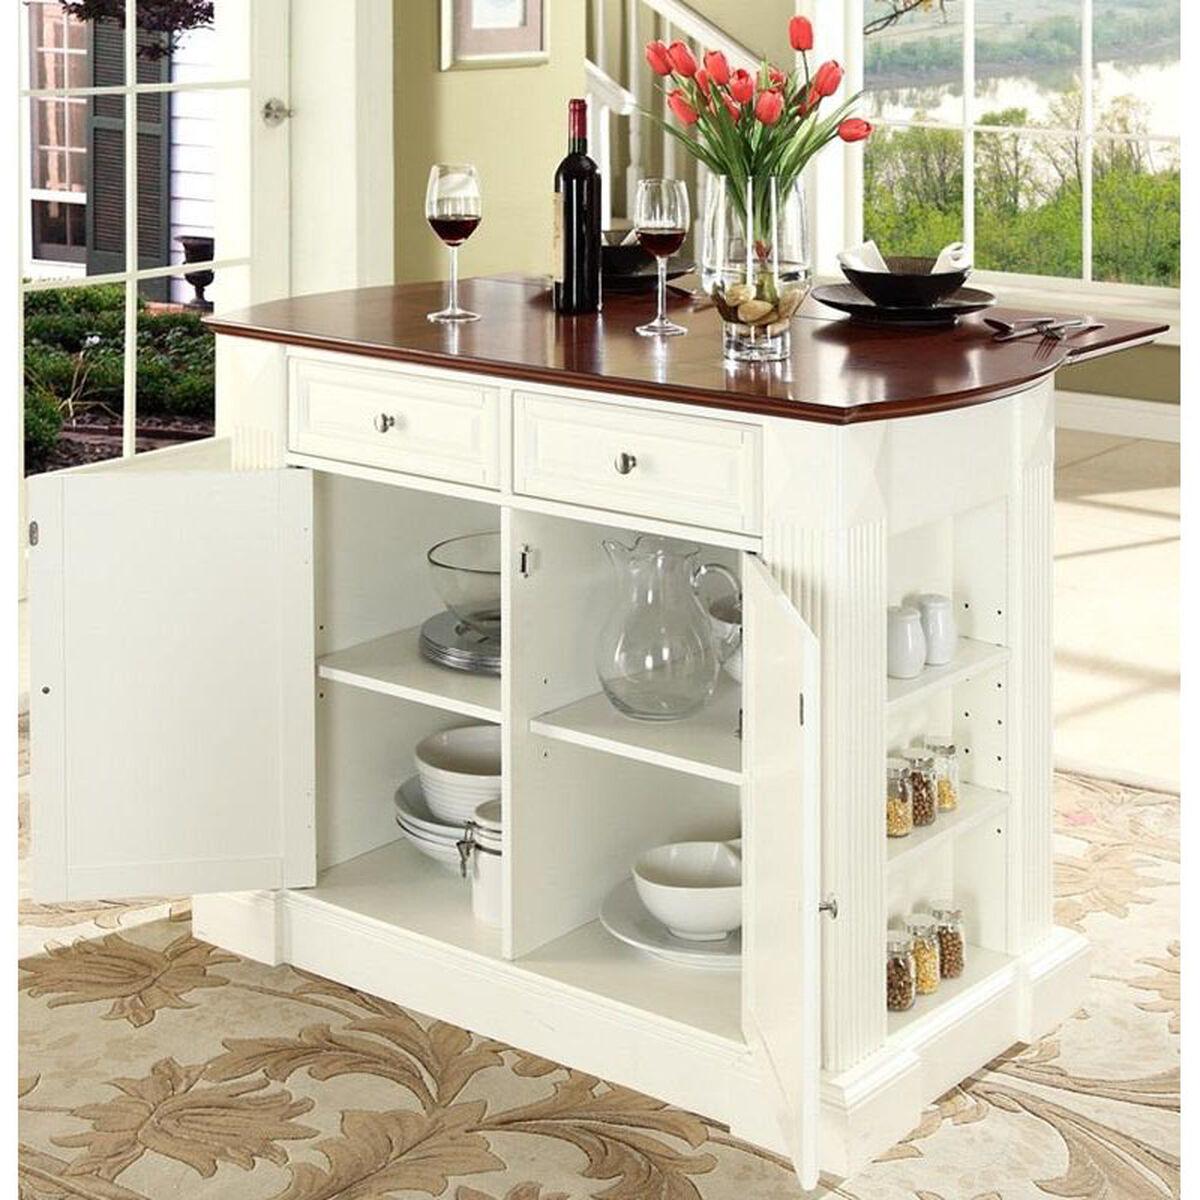 Drop Leaf Breakfast Bar Top Kitchen Island In Classic: Drop Leaf Kitchen Island KF30007WH